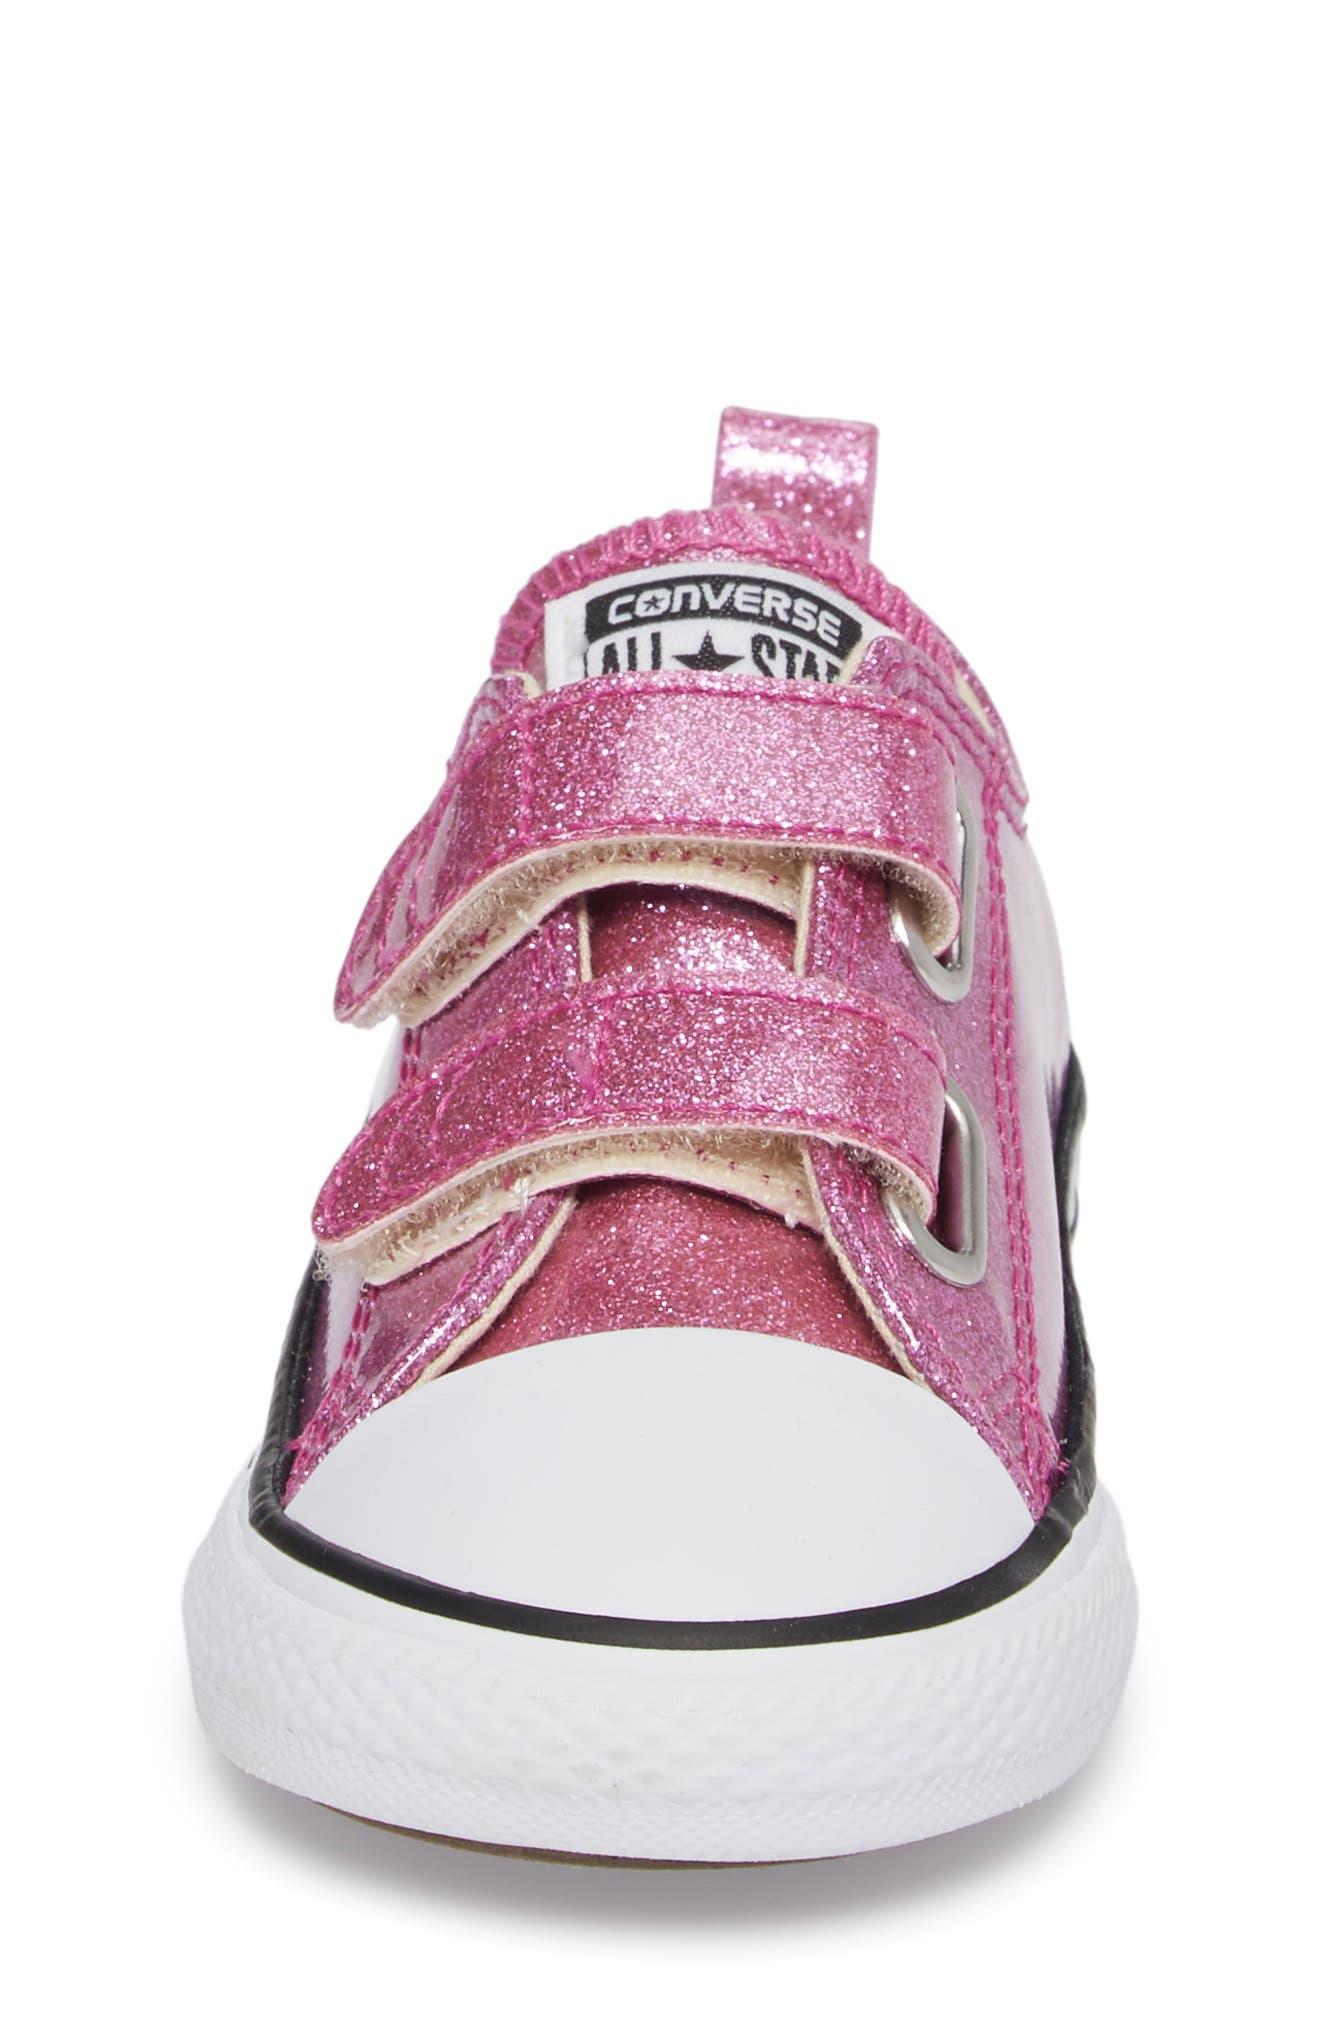 All Star<sup>®</sup> Seasonal Glitter Sneaker,                             Alternate thumbnail 4, color,                             500